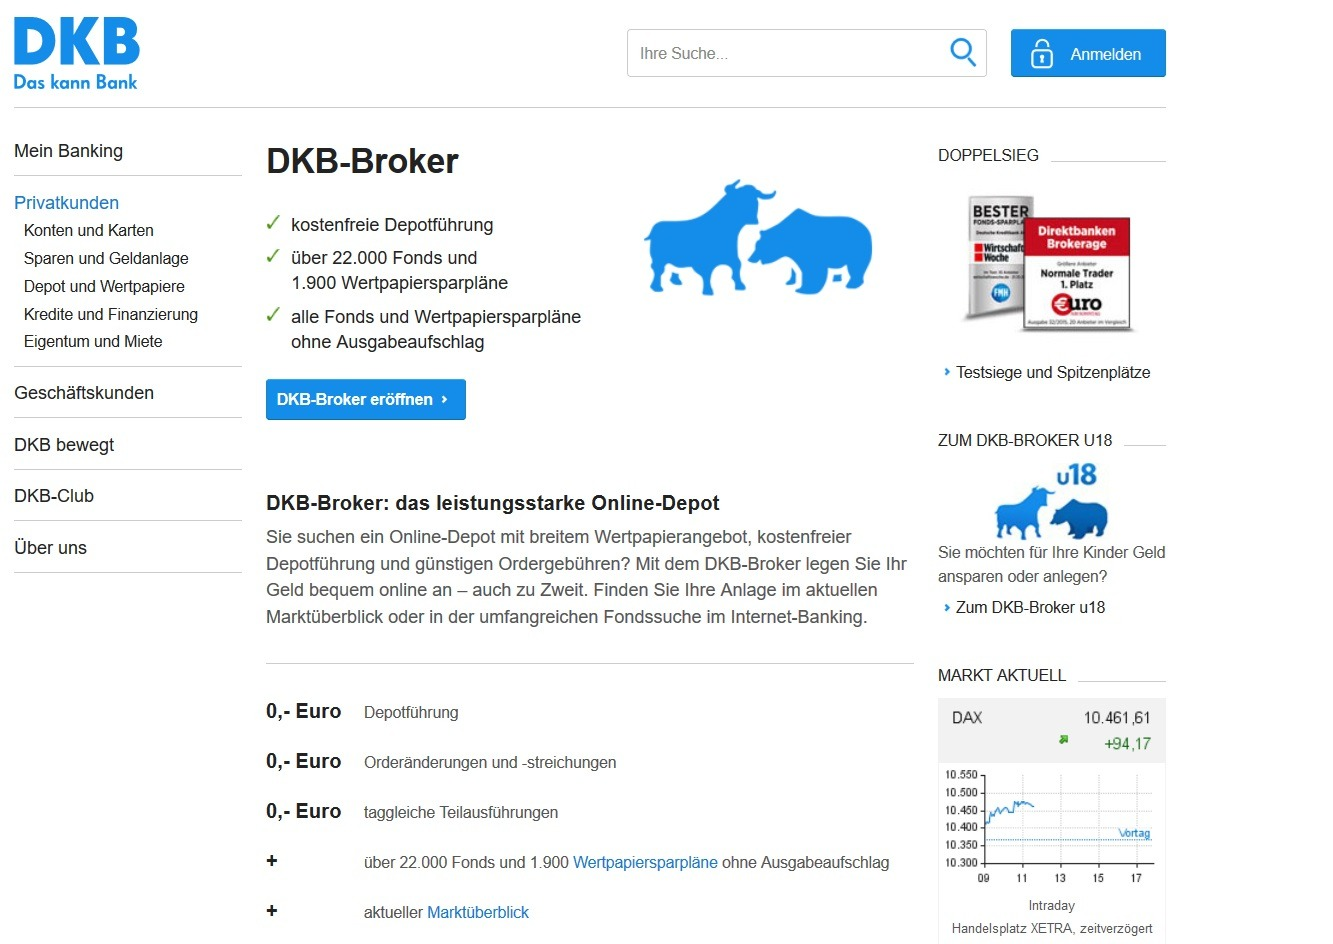 DKB Bank Depotübertrag mit Prämie